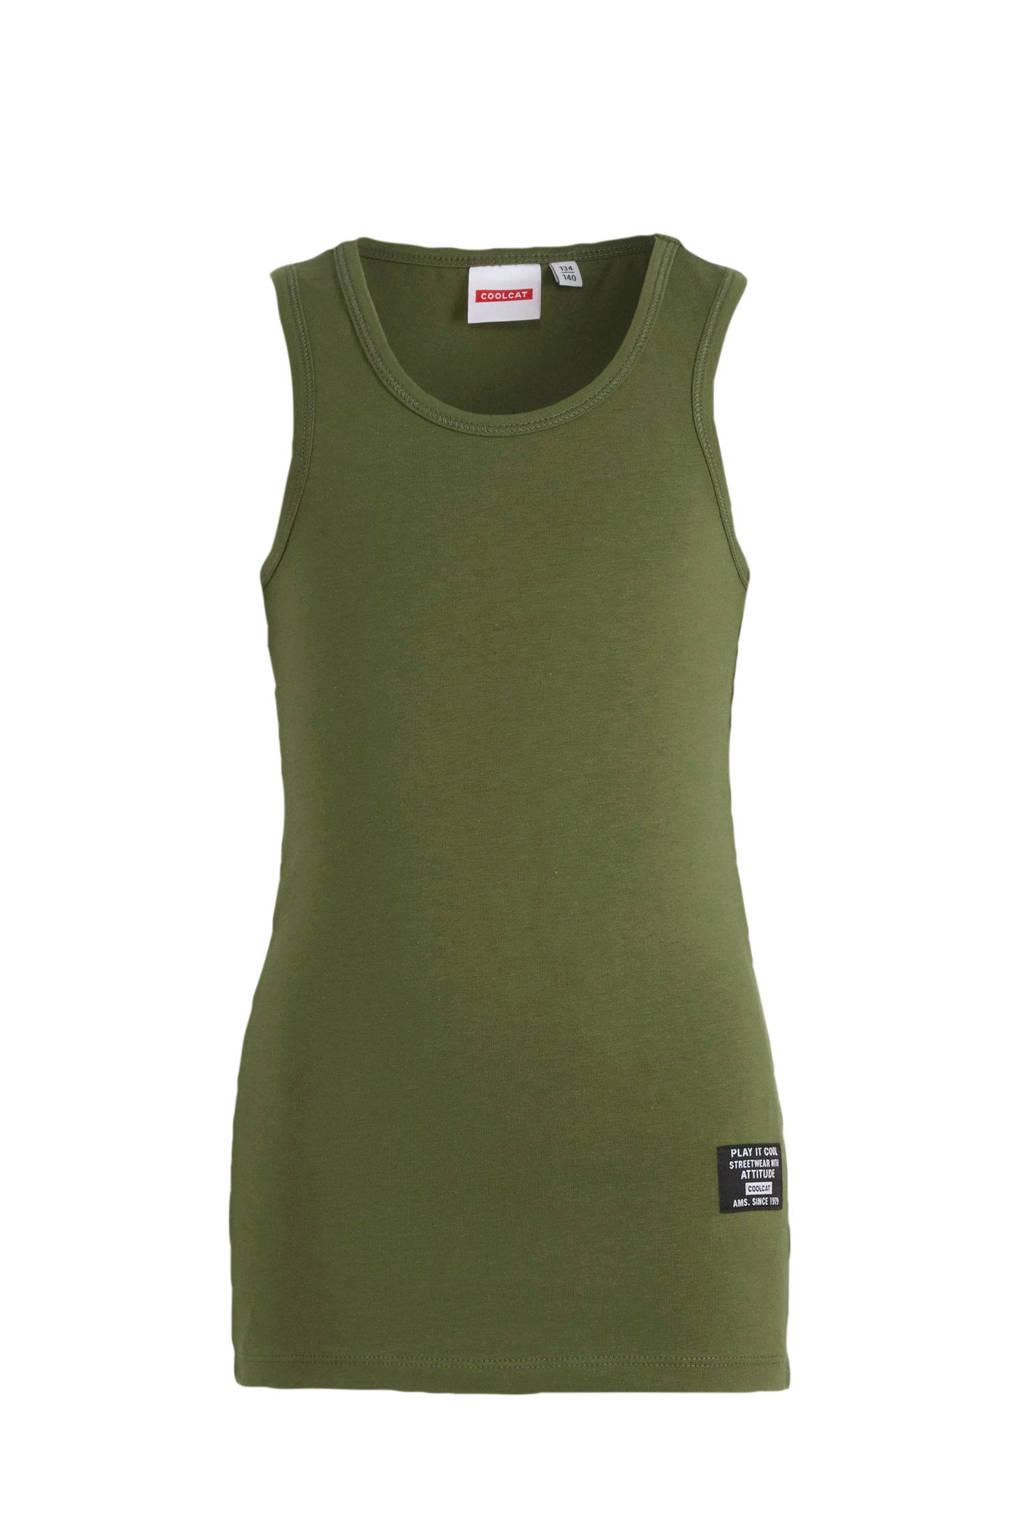 CoolCat Junior singlet Gio army groen, Army groen